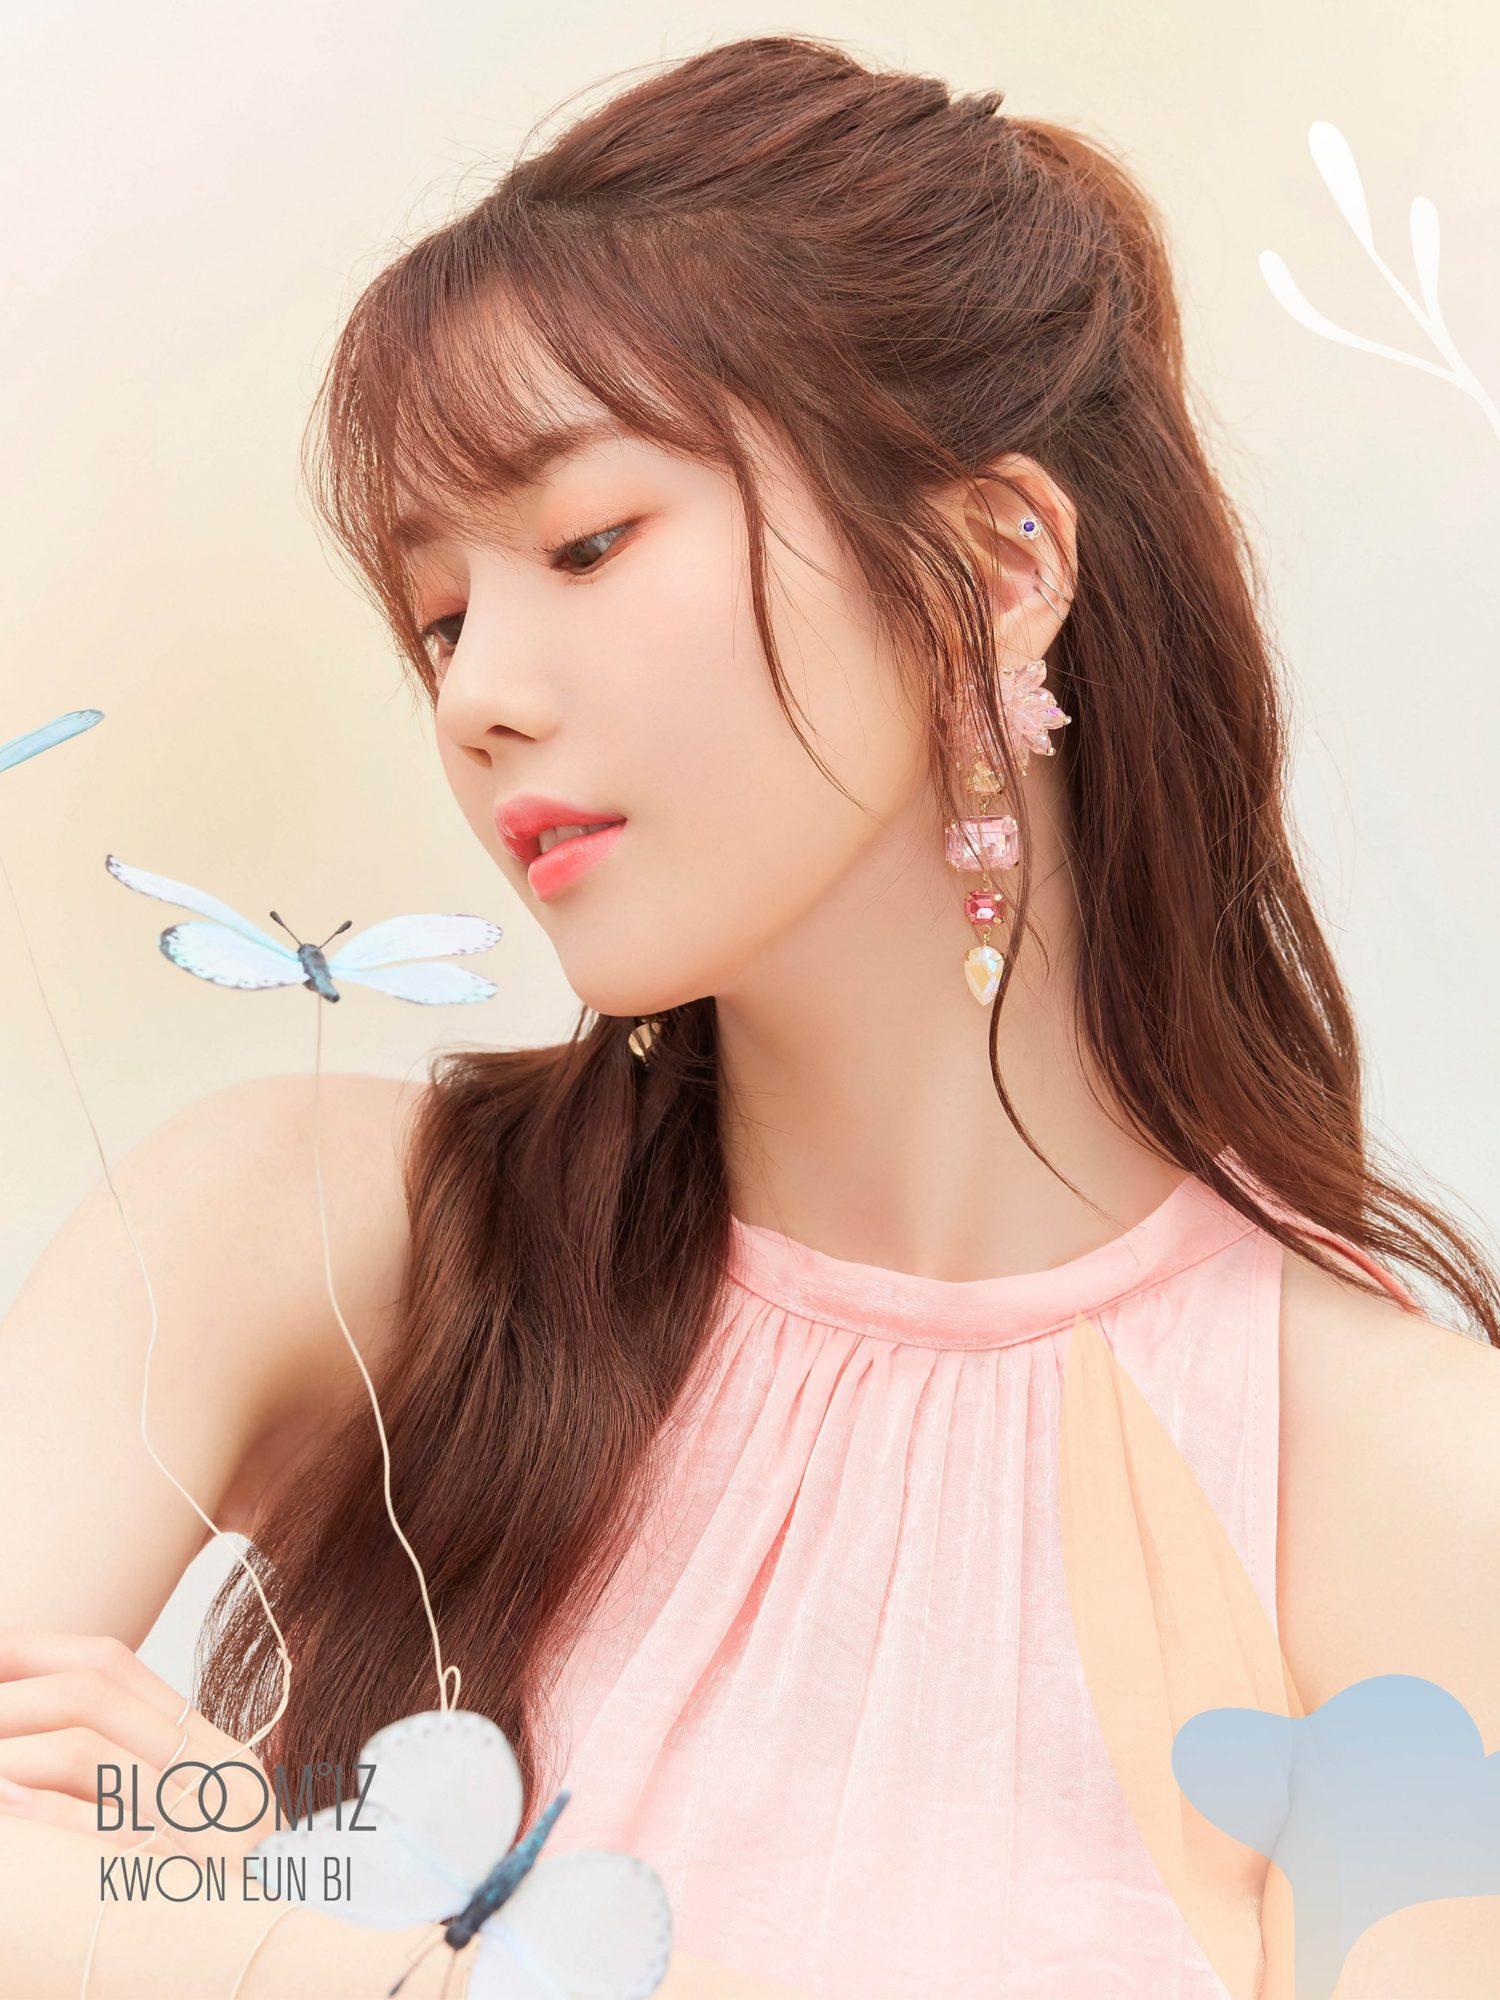 Iz One Bloom Iz Eunbi Minju Chaeyeon Teaser Photos Hd Hr